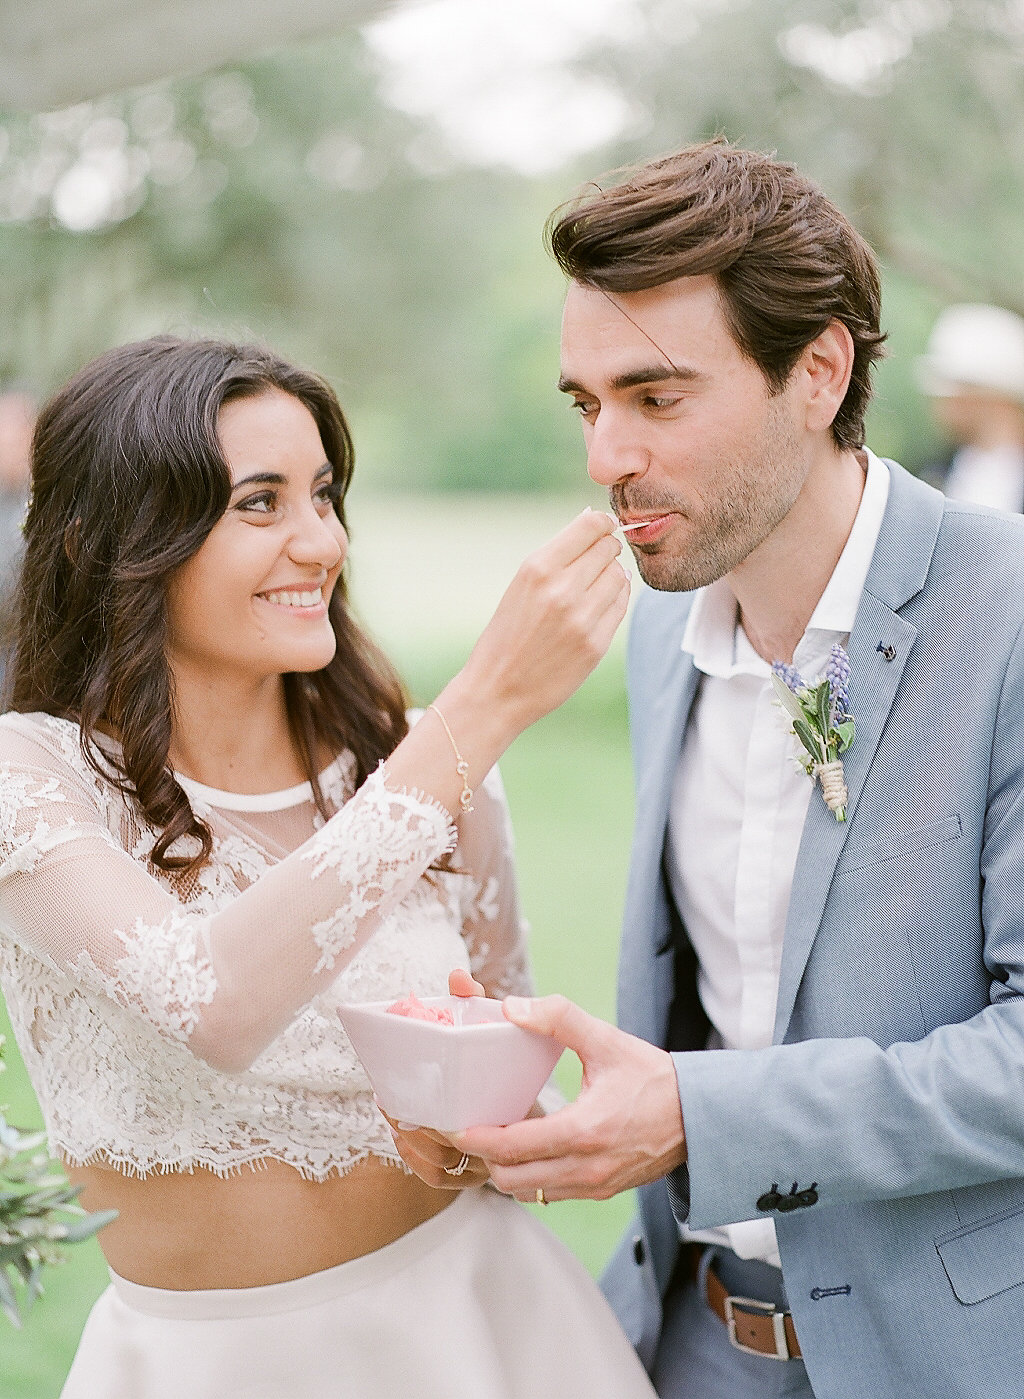 le coeur dans les etoiles - wedding planner - provence - luberon - alpilles - drome - vaucluse - sardaigne - italie - organisation - mariage - shooting - dolce vita - valery villard-343